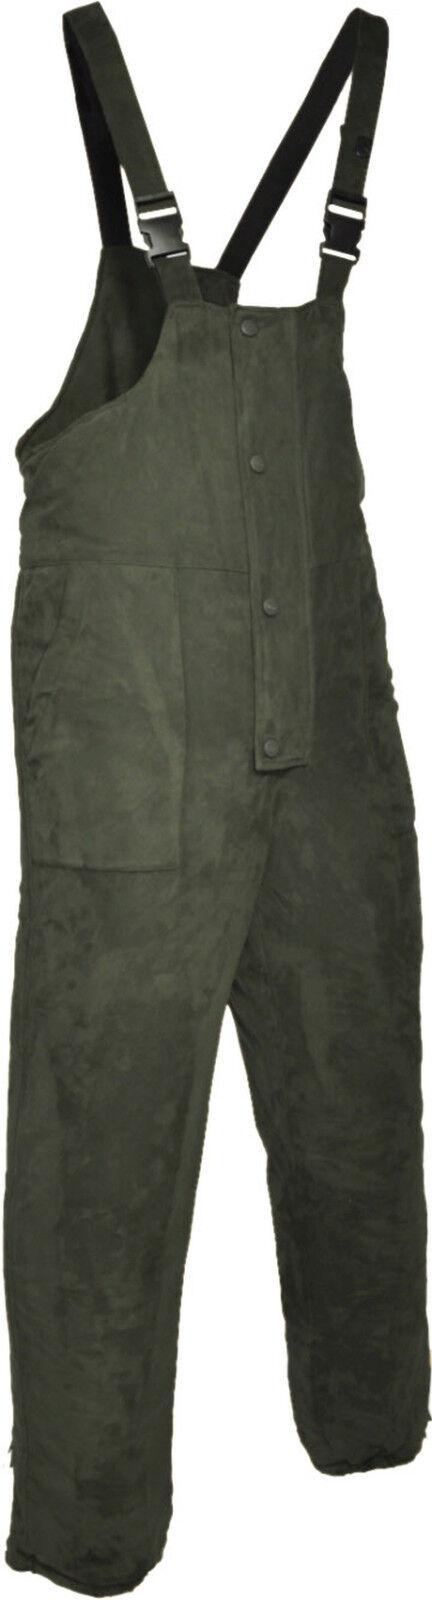 Micro Fibre Fur Ansitz Trousers Miporex Hubertus Ansitz Trousers 52